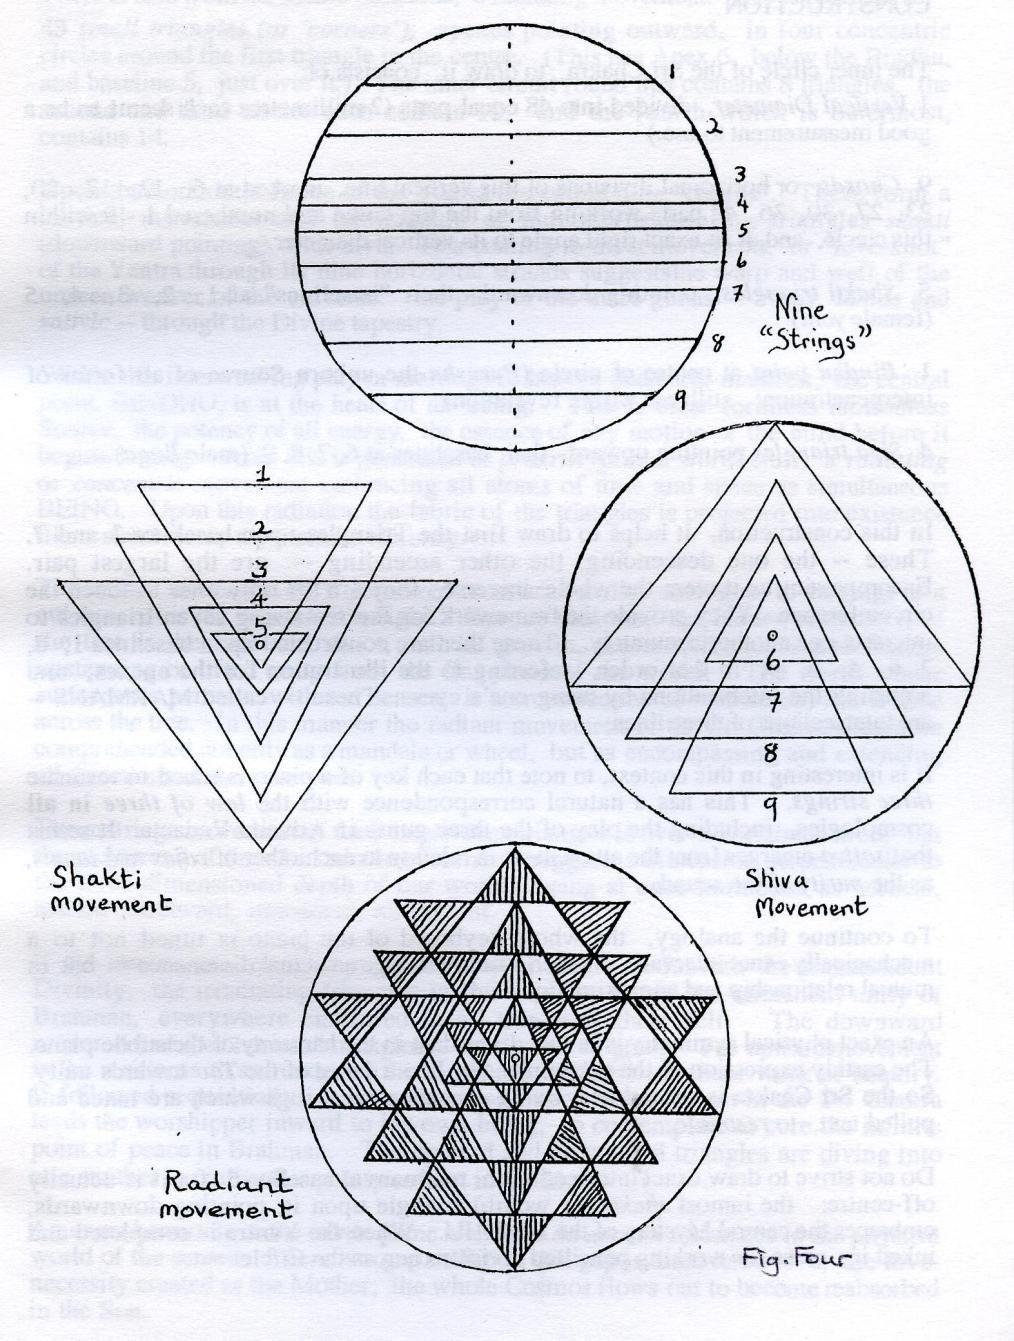 How To Draw The Sri Chakra Yantra Chakra Sri Yantra And Tarot